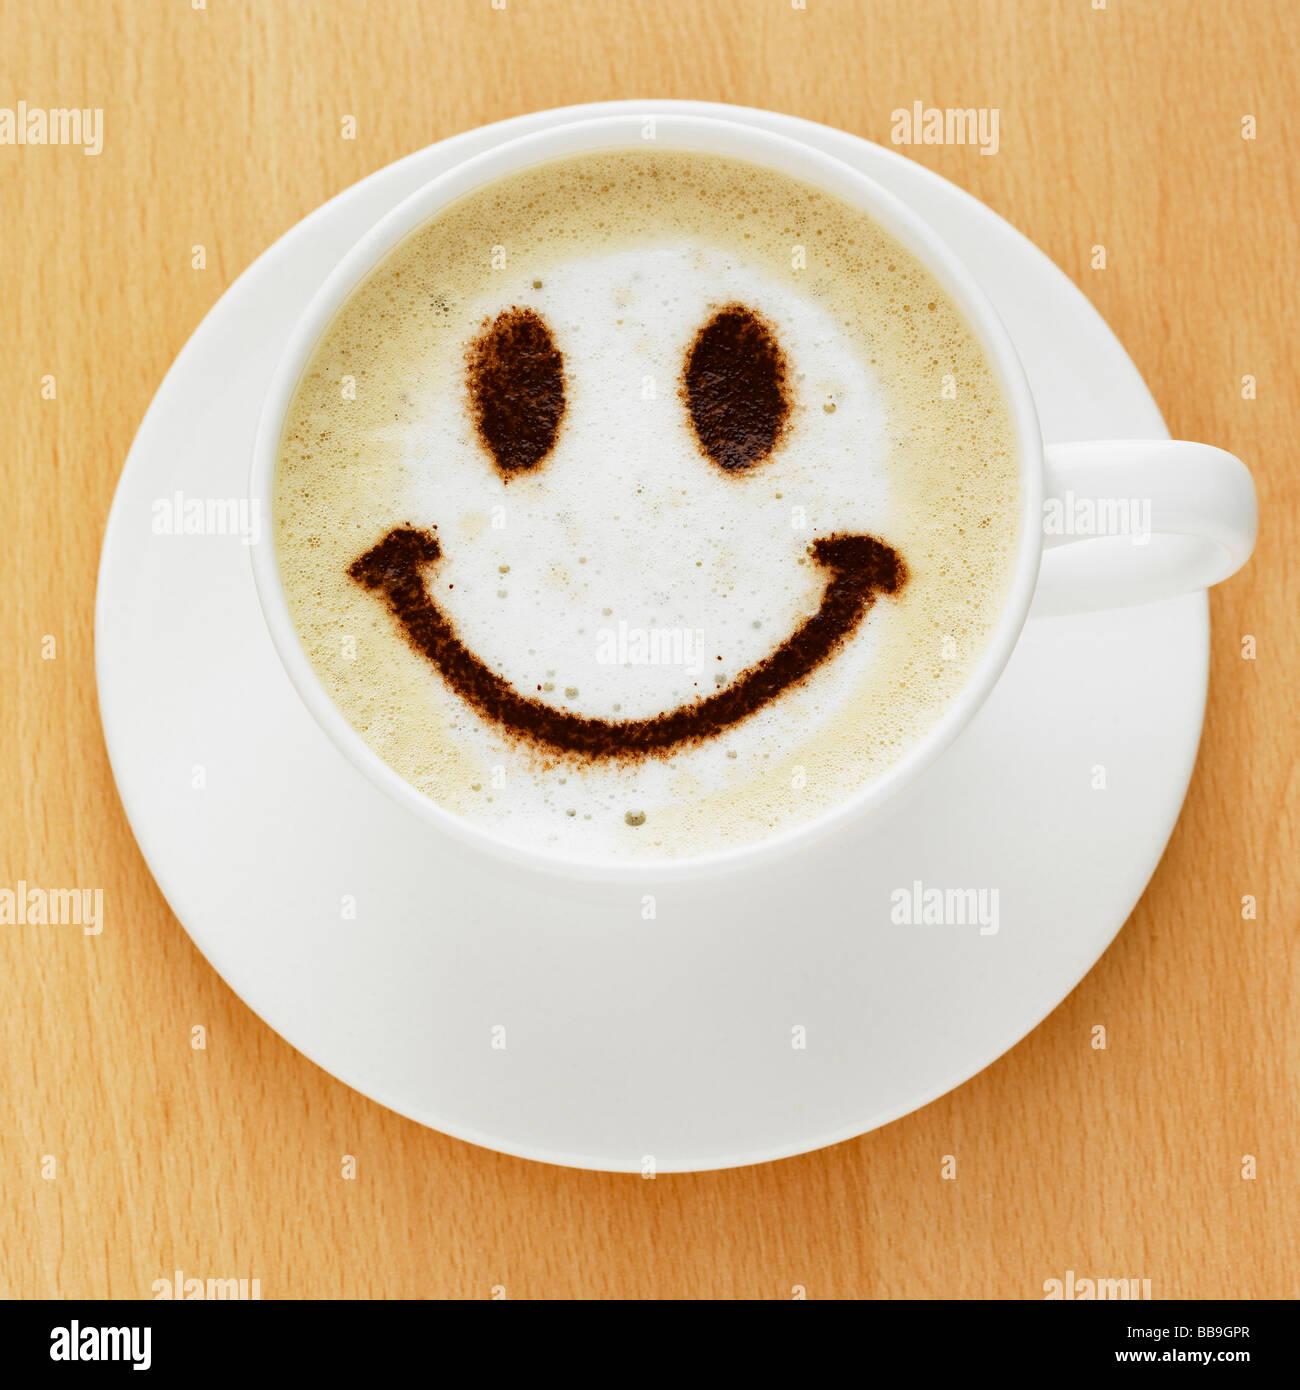 Smiley coffee stockfotos smiley coffee bilder alamy - Bilder cappuccino ...